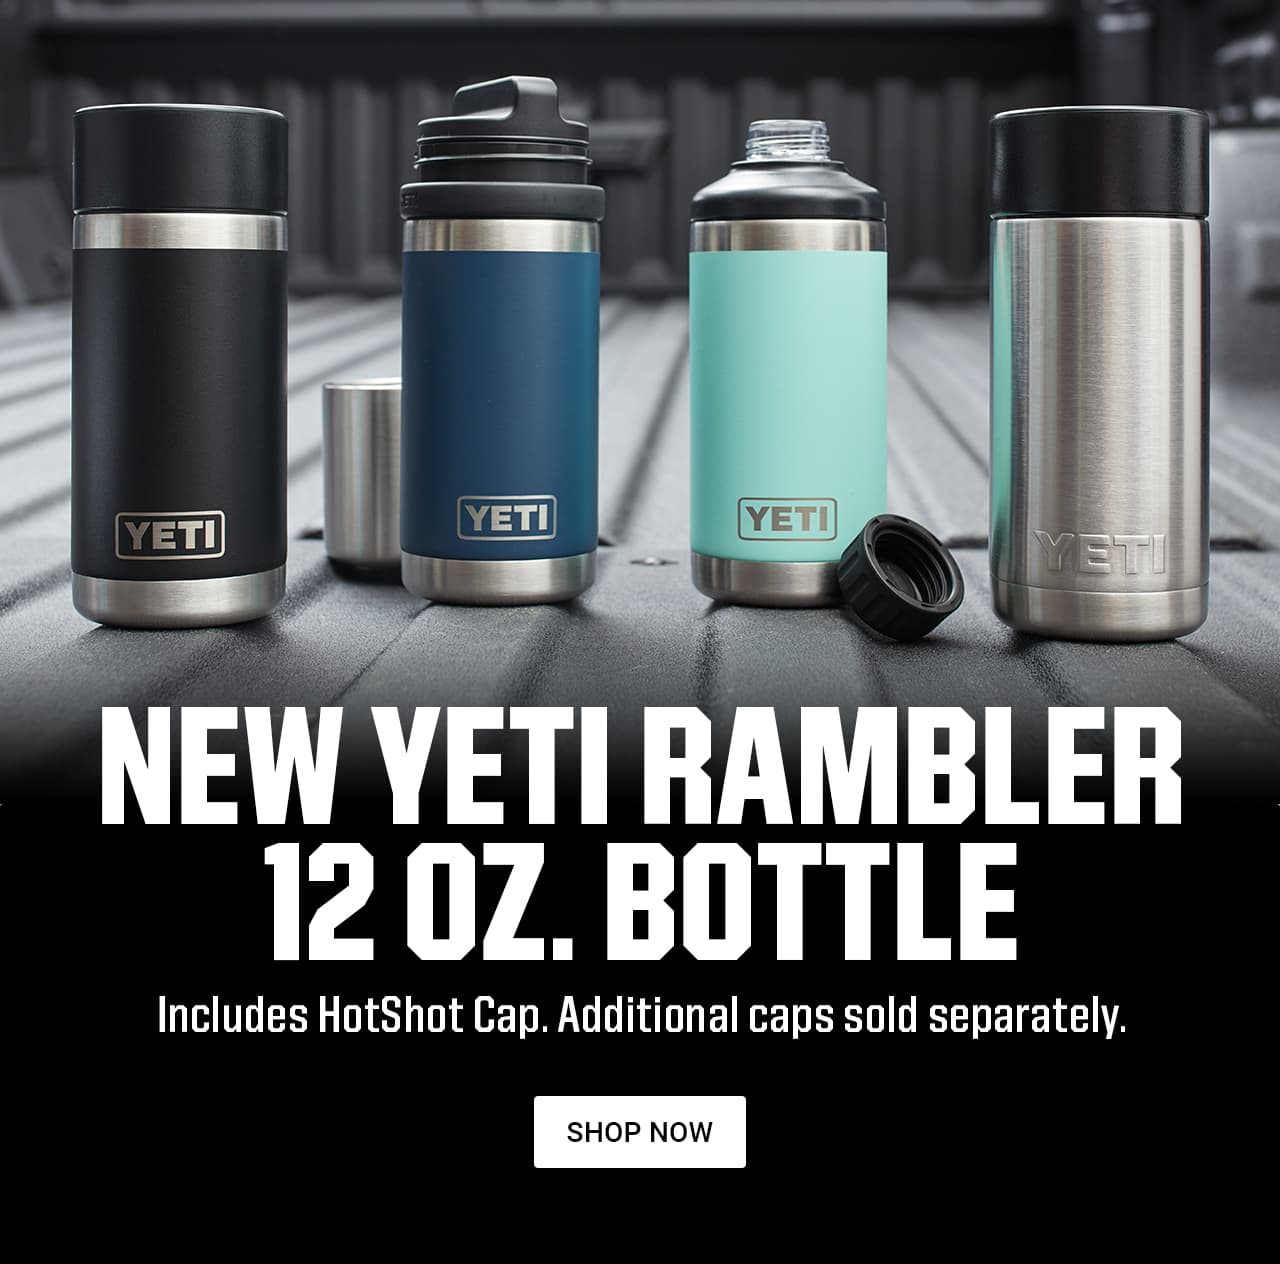 c3f679b49d5 NEW YETI RAMBLER 12 OZ. BOTTLE | Includes HotShot Cap. Additional caps sold  separately